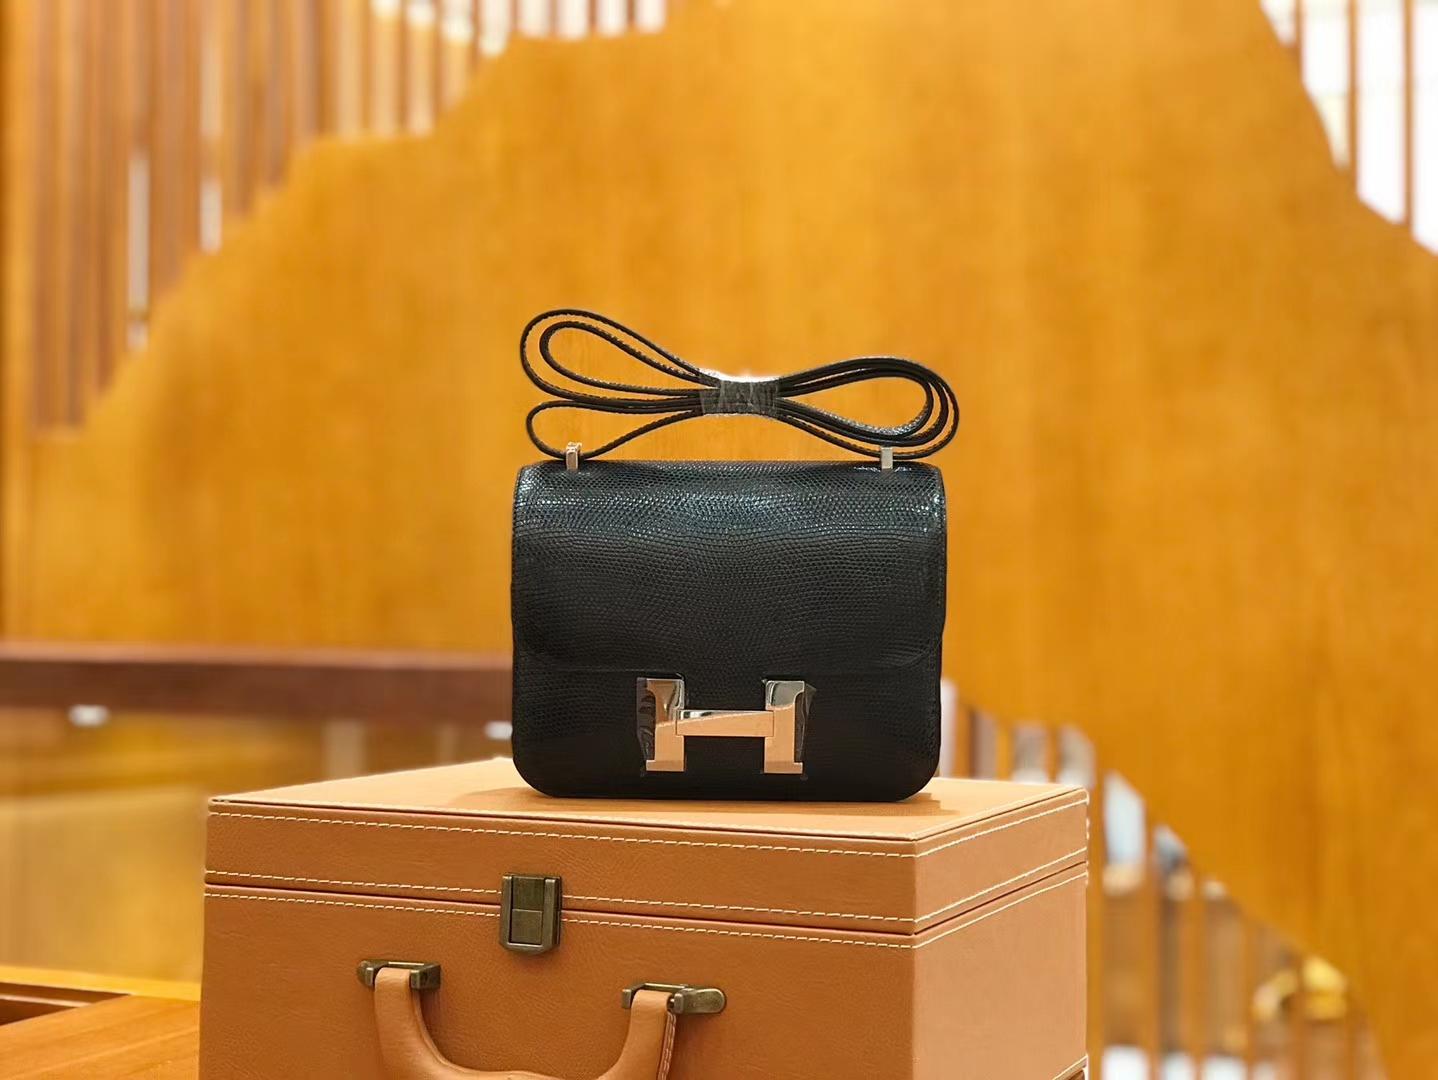 Hermès(爱马仕)Constance 18cm 经典黑 南非野生蜥蜴皮 银扣 原版蜜蜡线 顶级手缝